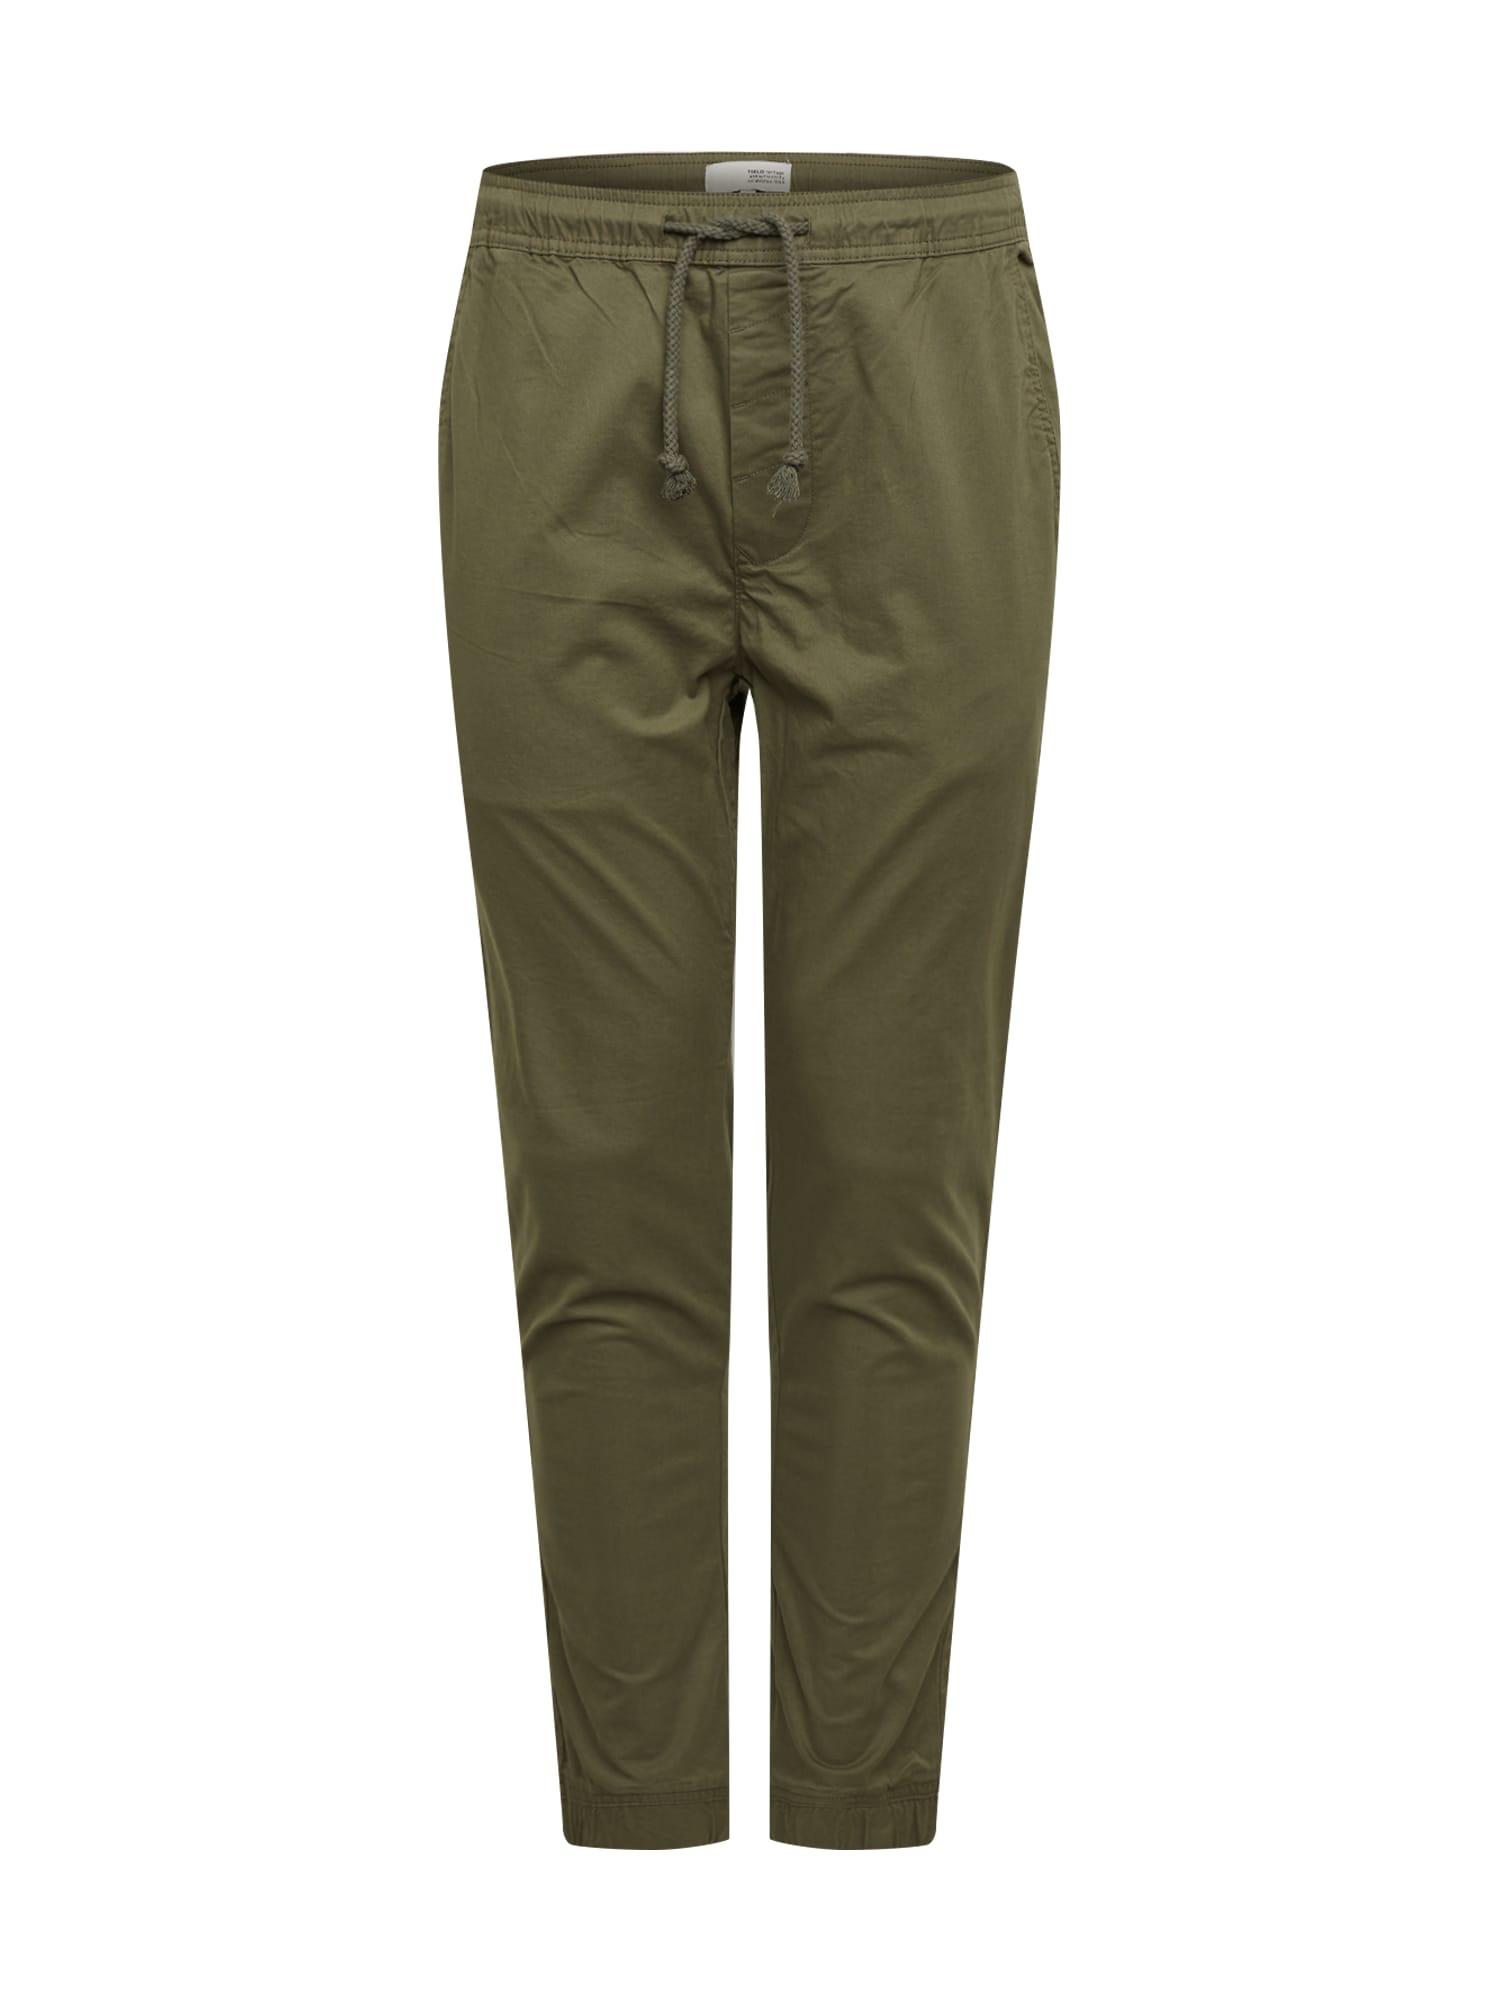 !Solid Pantalon 'Slim-Truc Cuff'  - Vert - Taille: XL - male